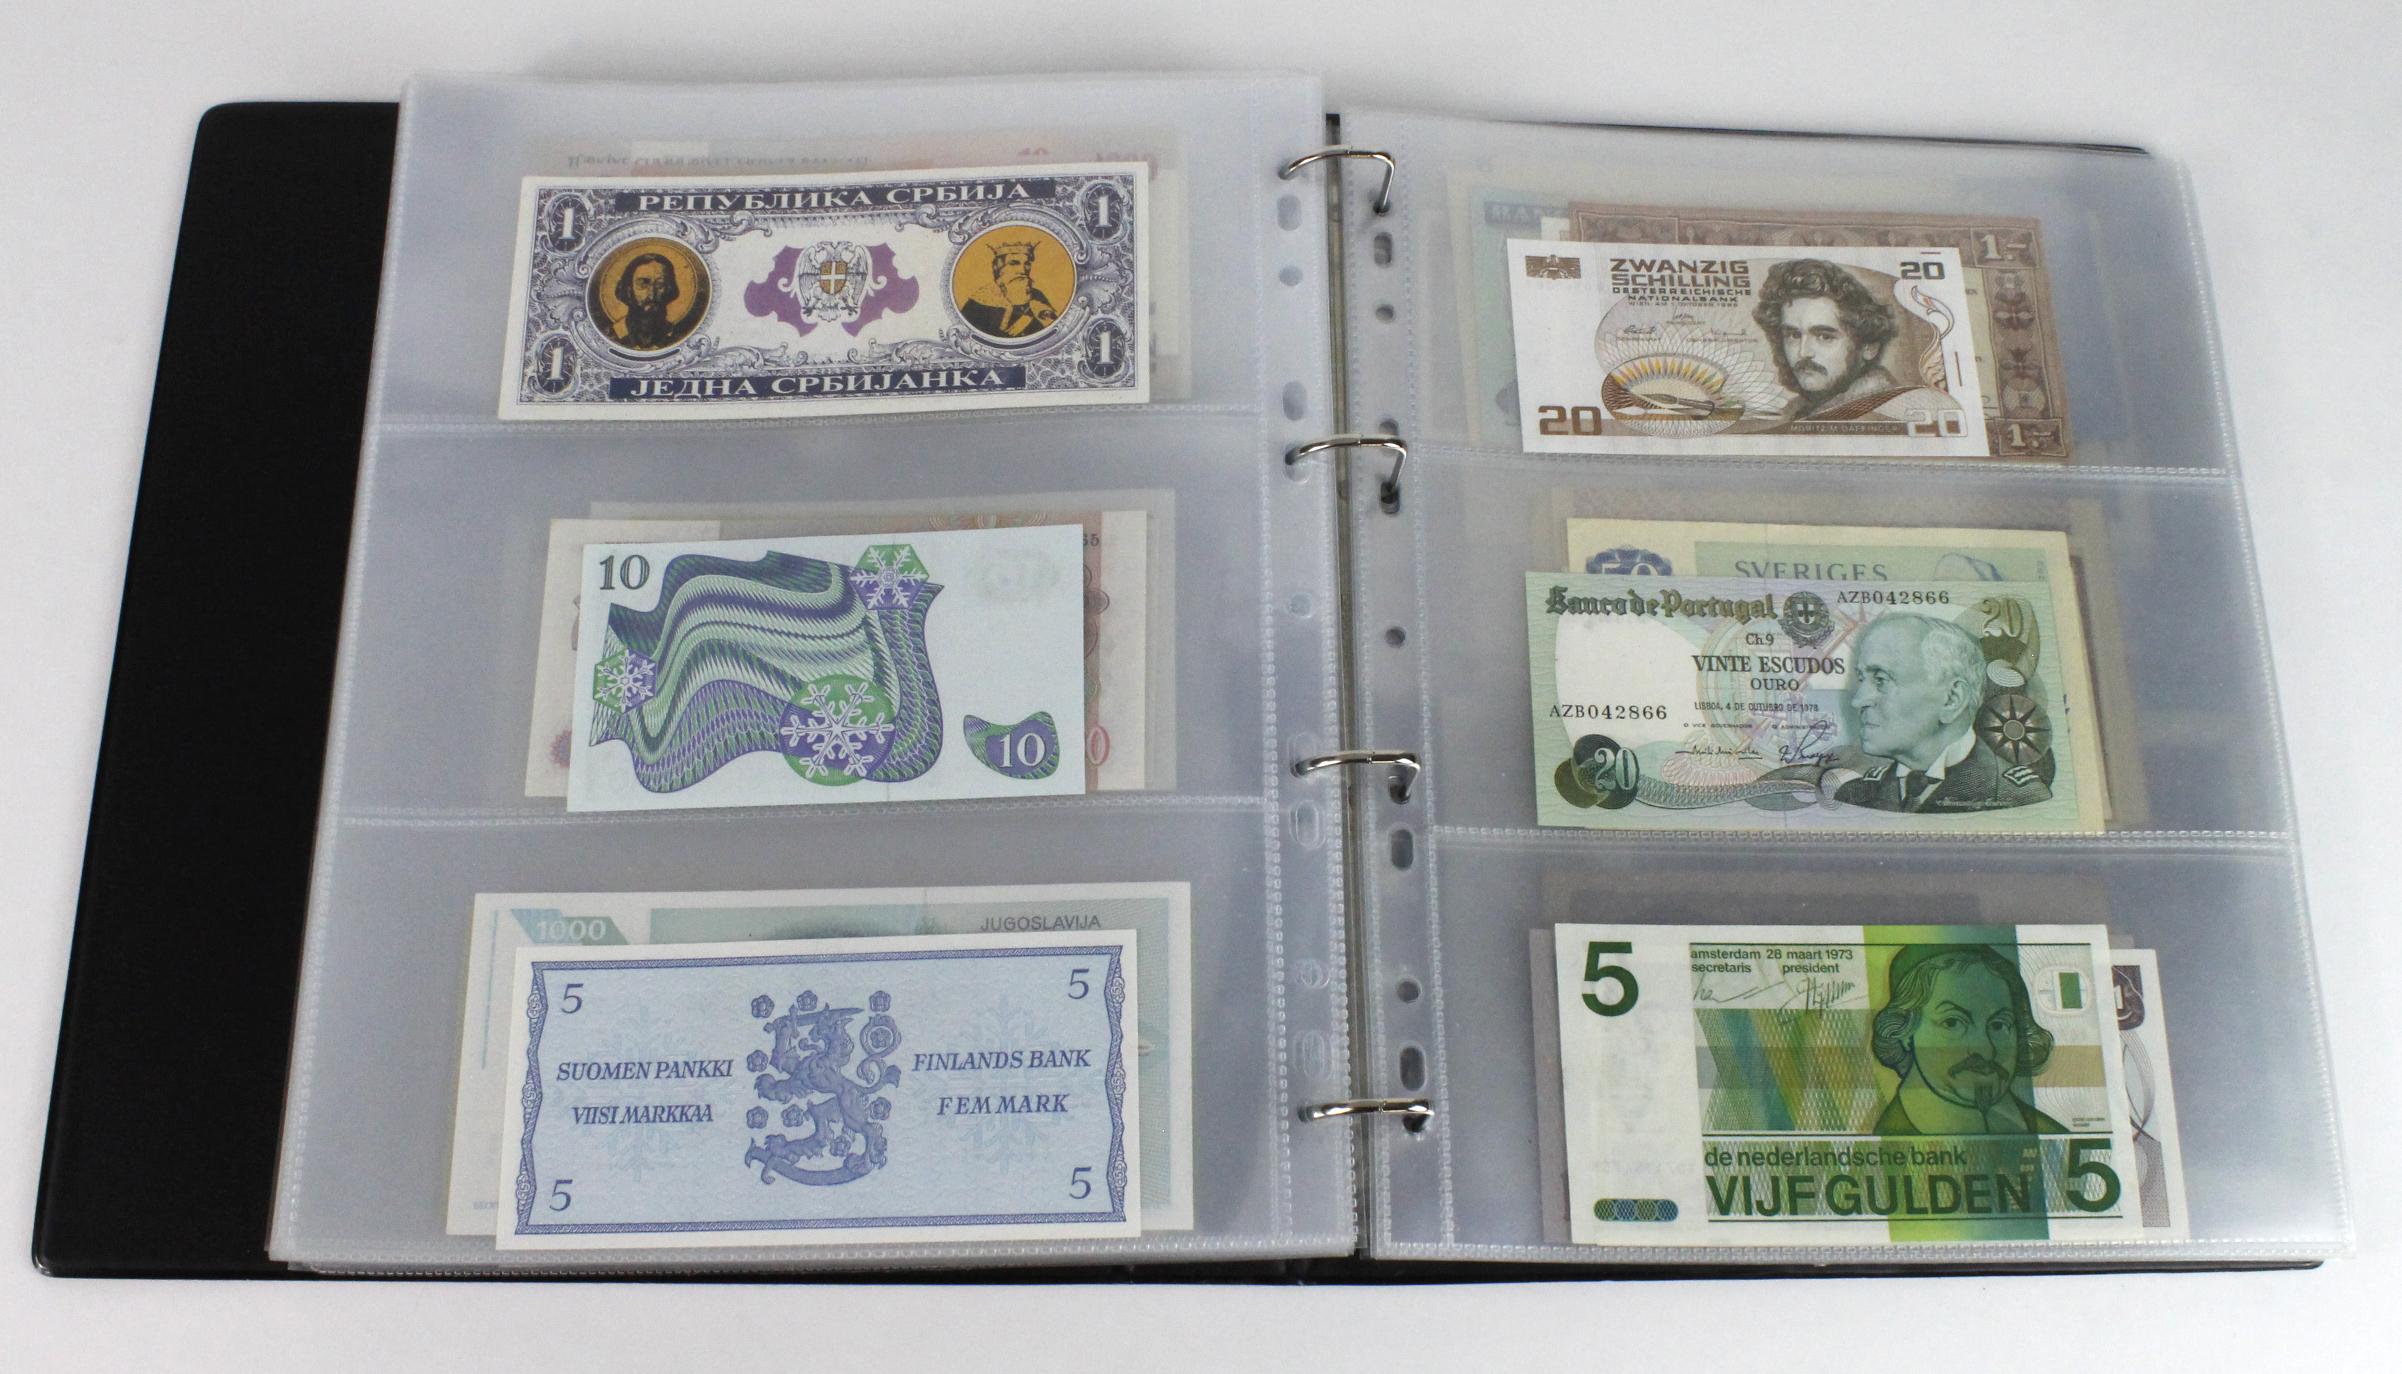 World (163), in banknote album including Bahamas, Spain, Sweden, Netherlands, Algeria, Macau, - Image 45 of 57